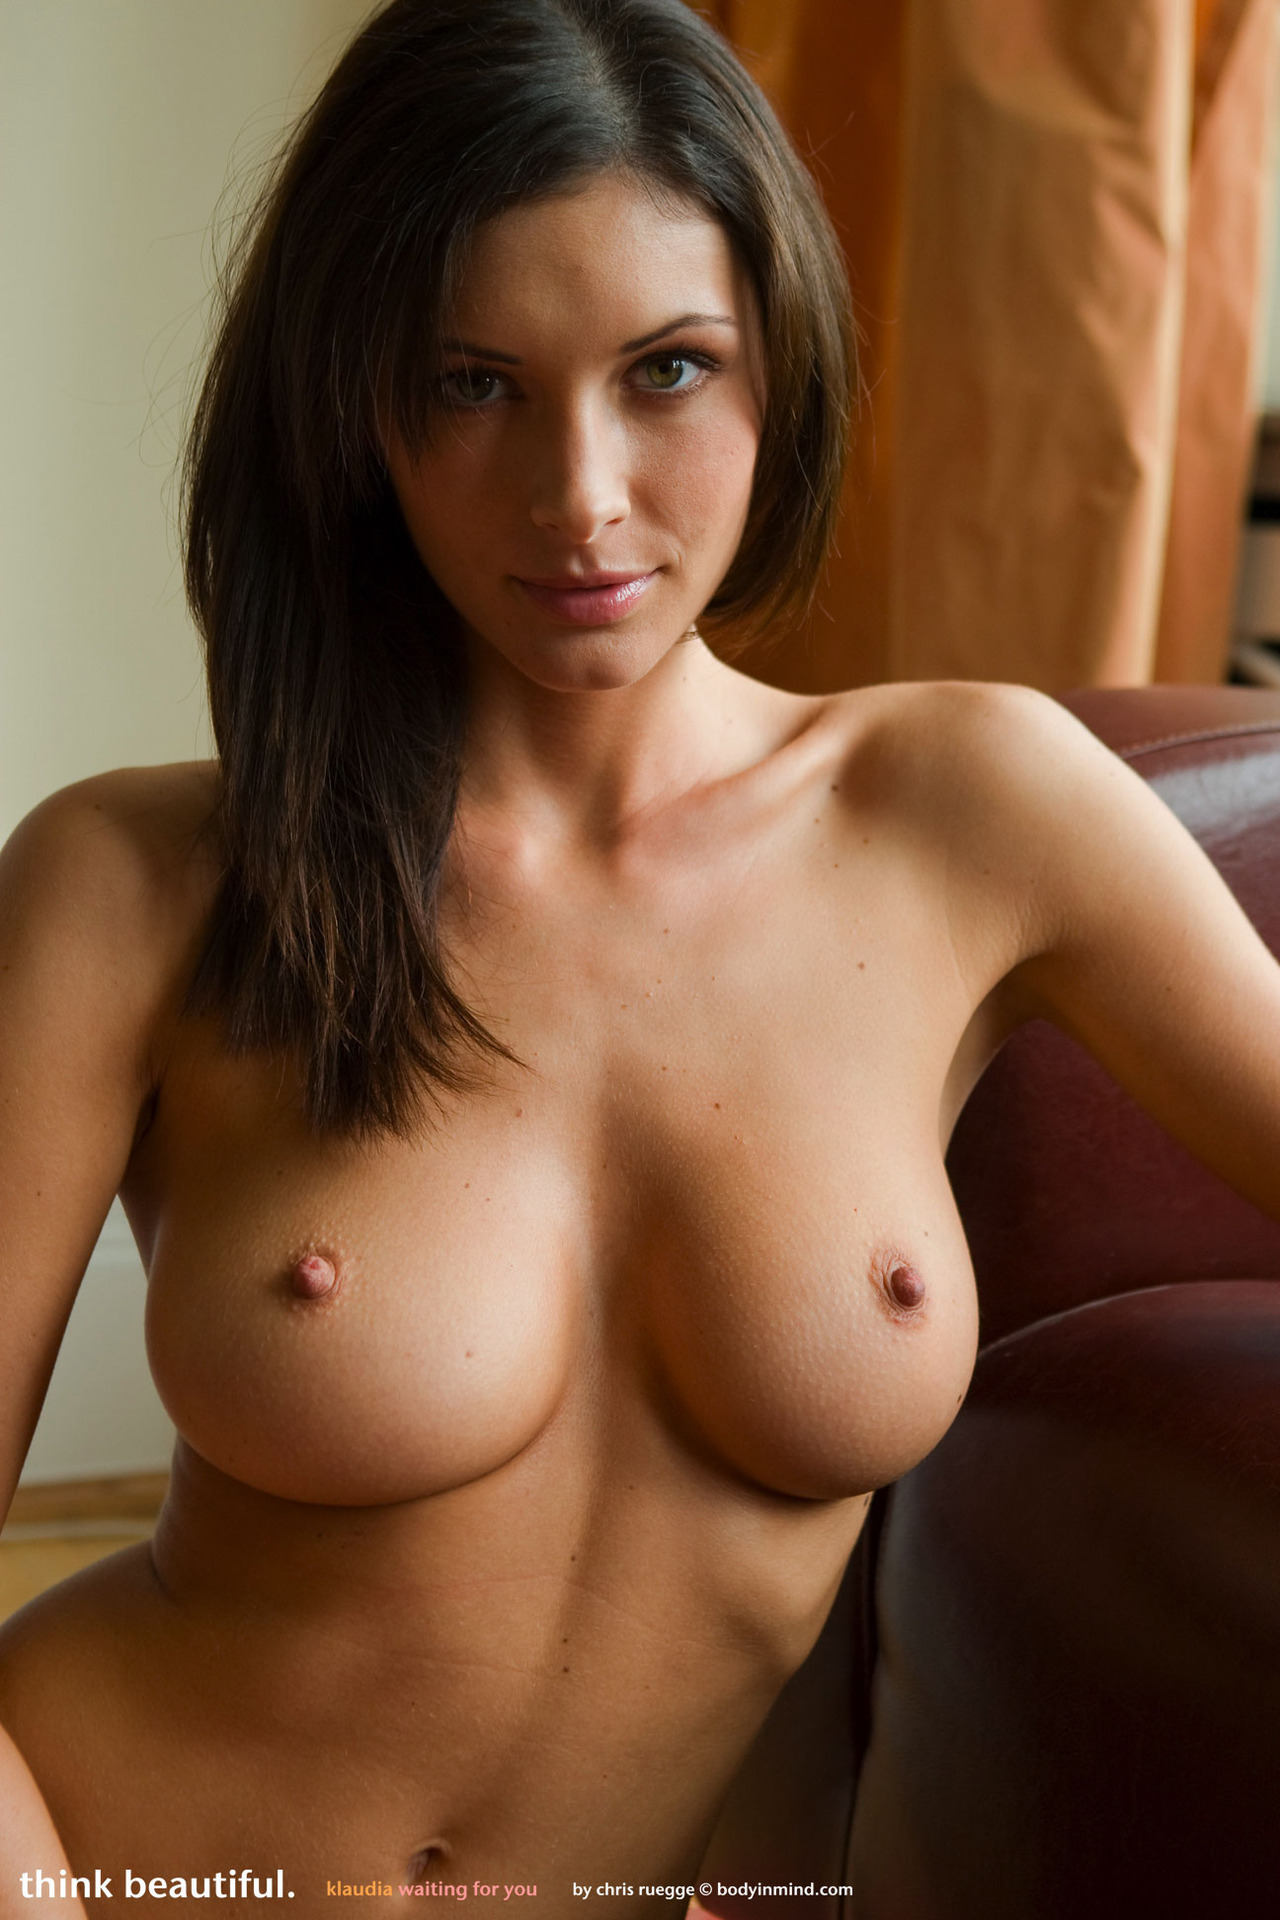 tits and nipples tumblr